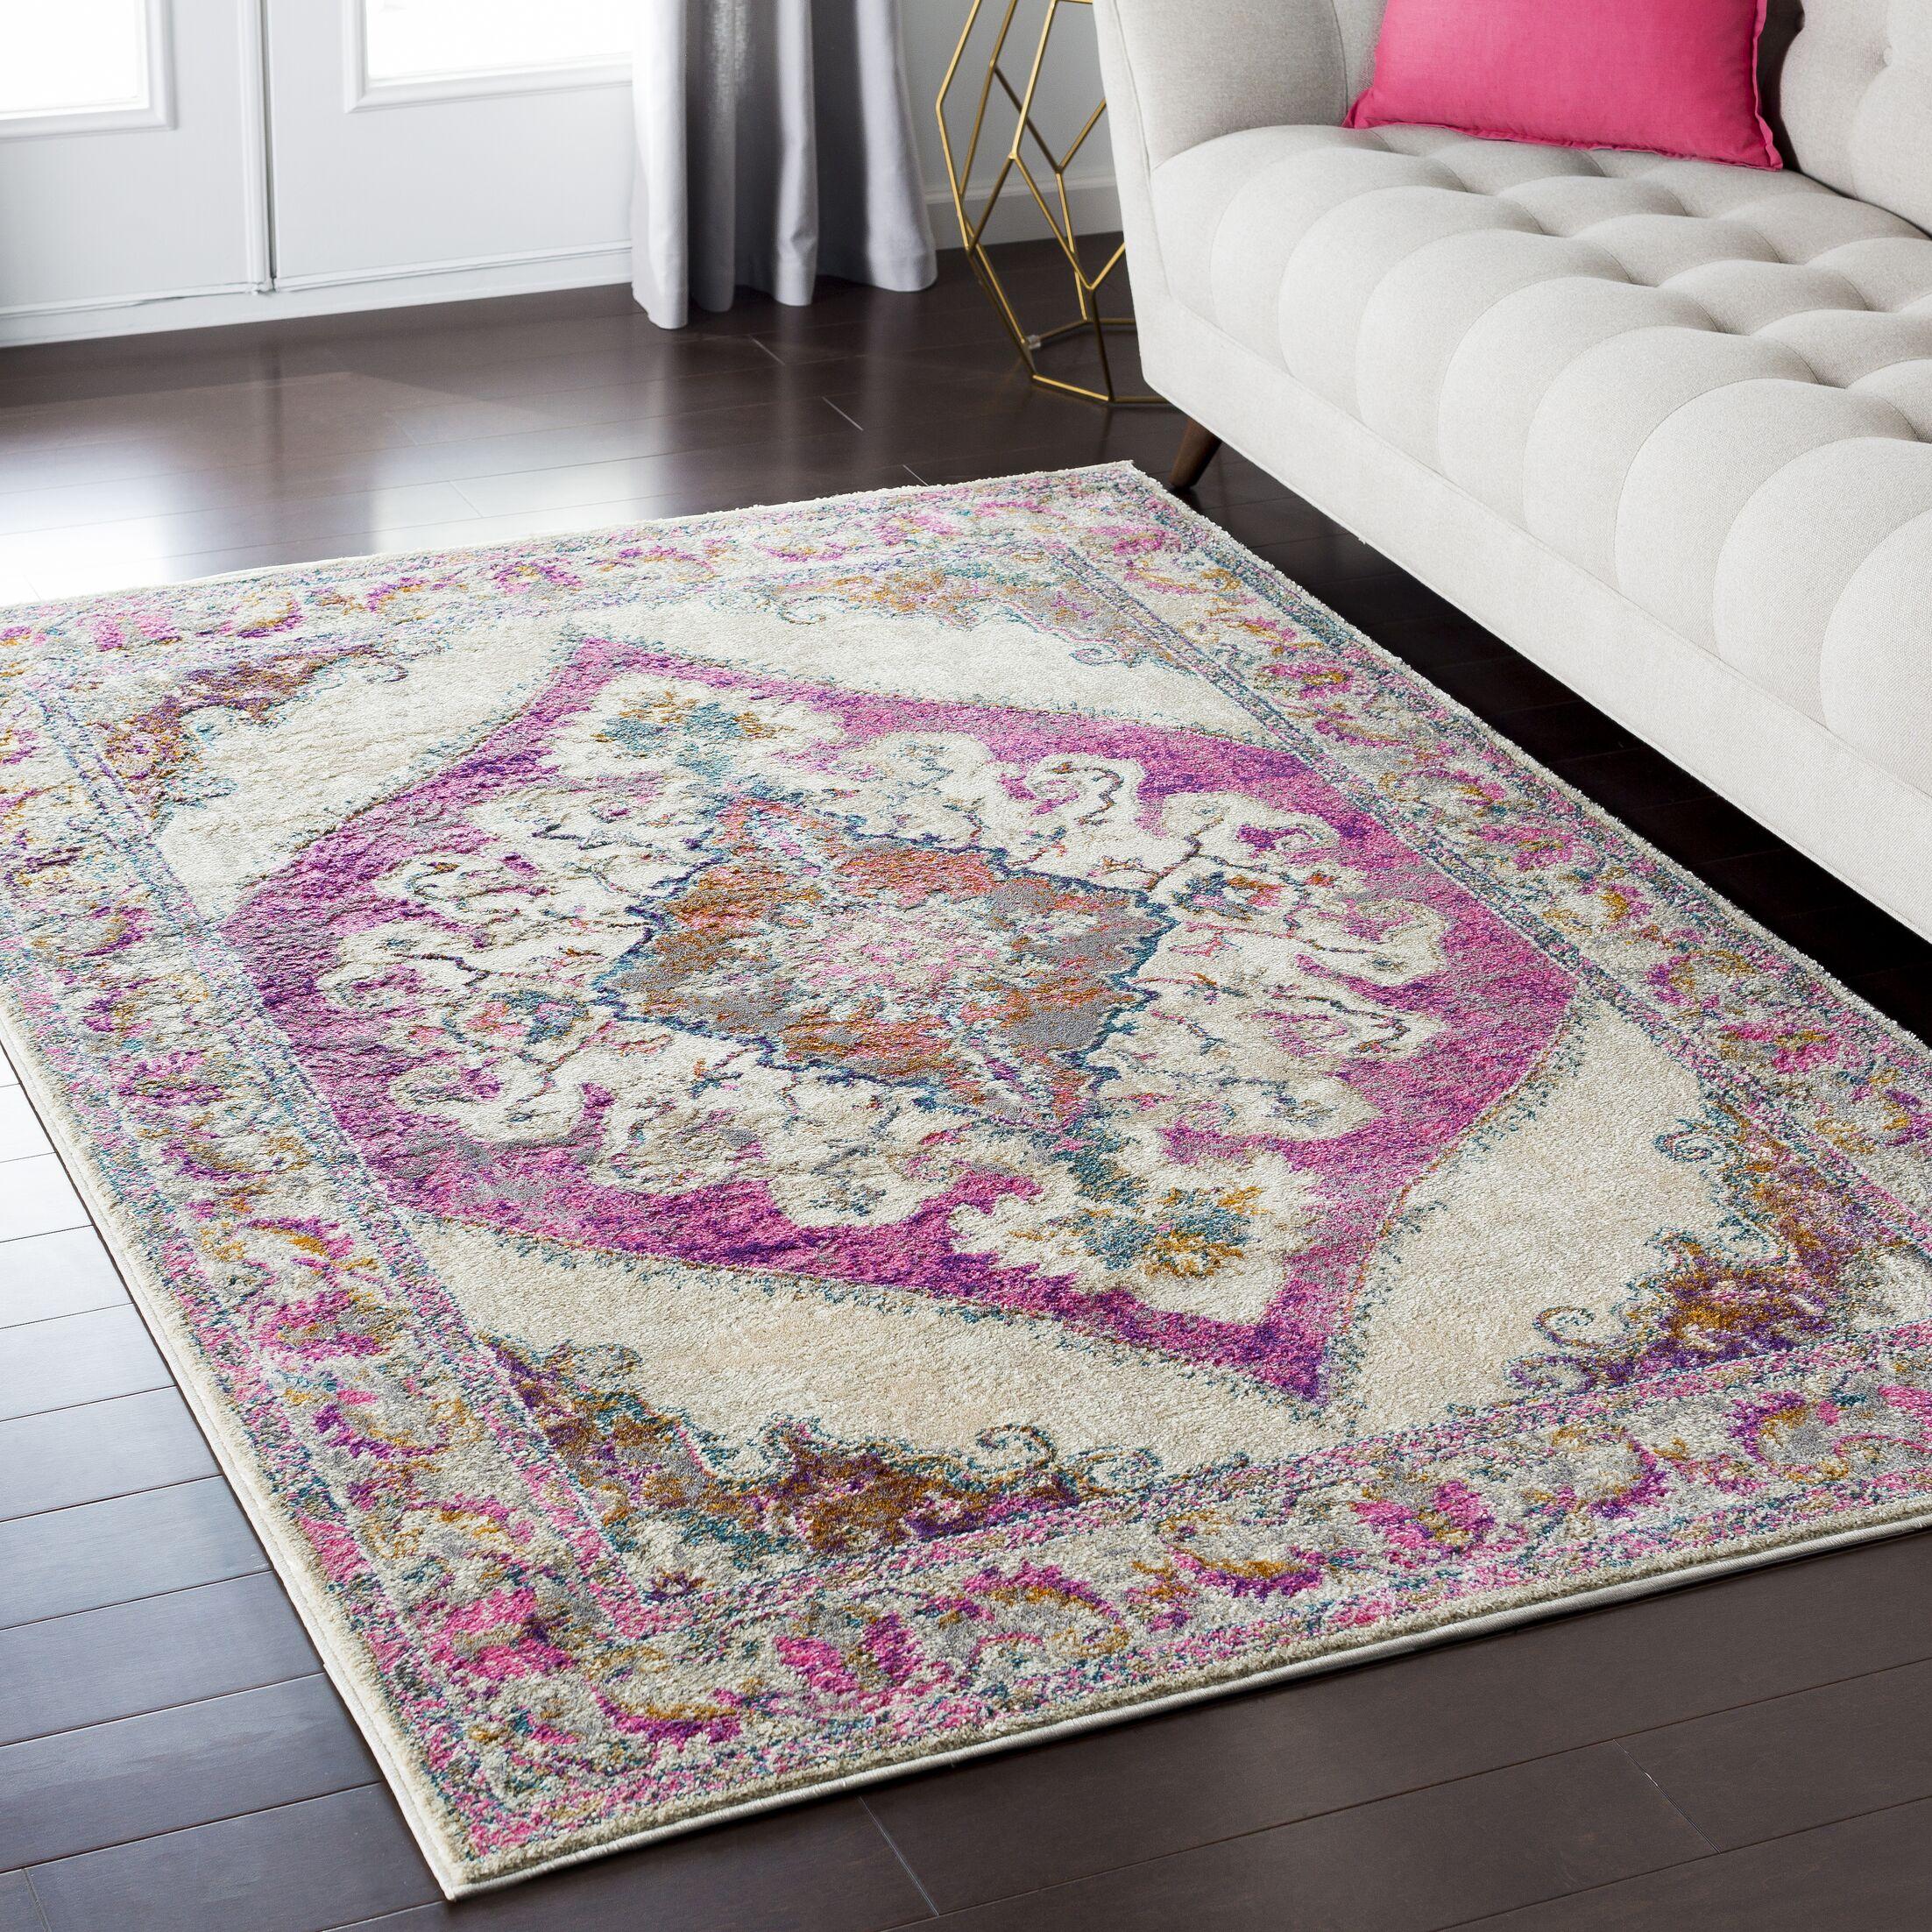 Alpharetta Pink Area Rug Rug Size: Rectangle 7'10